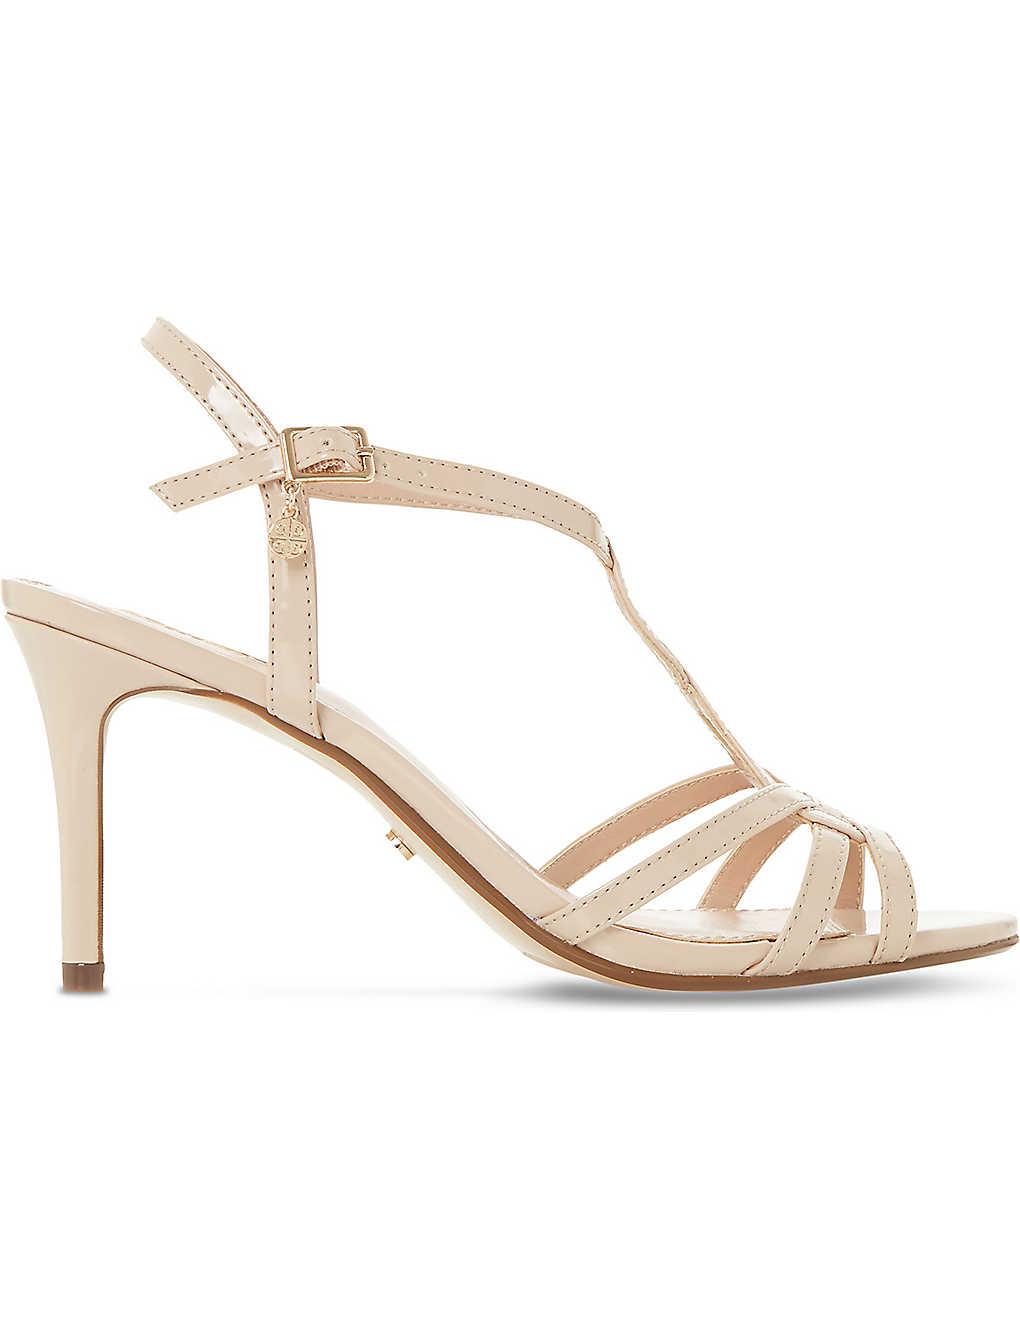 d011541ee5ab0 DUNE - Miniee strappy heeled sandals | Selfridges.com